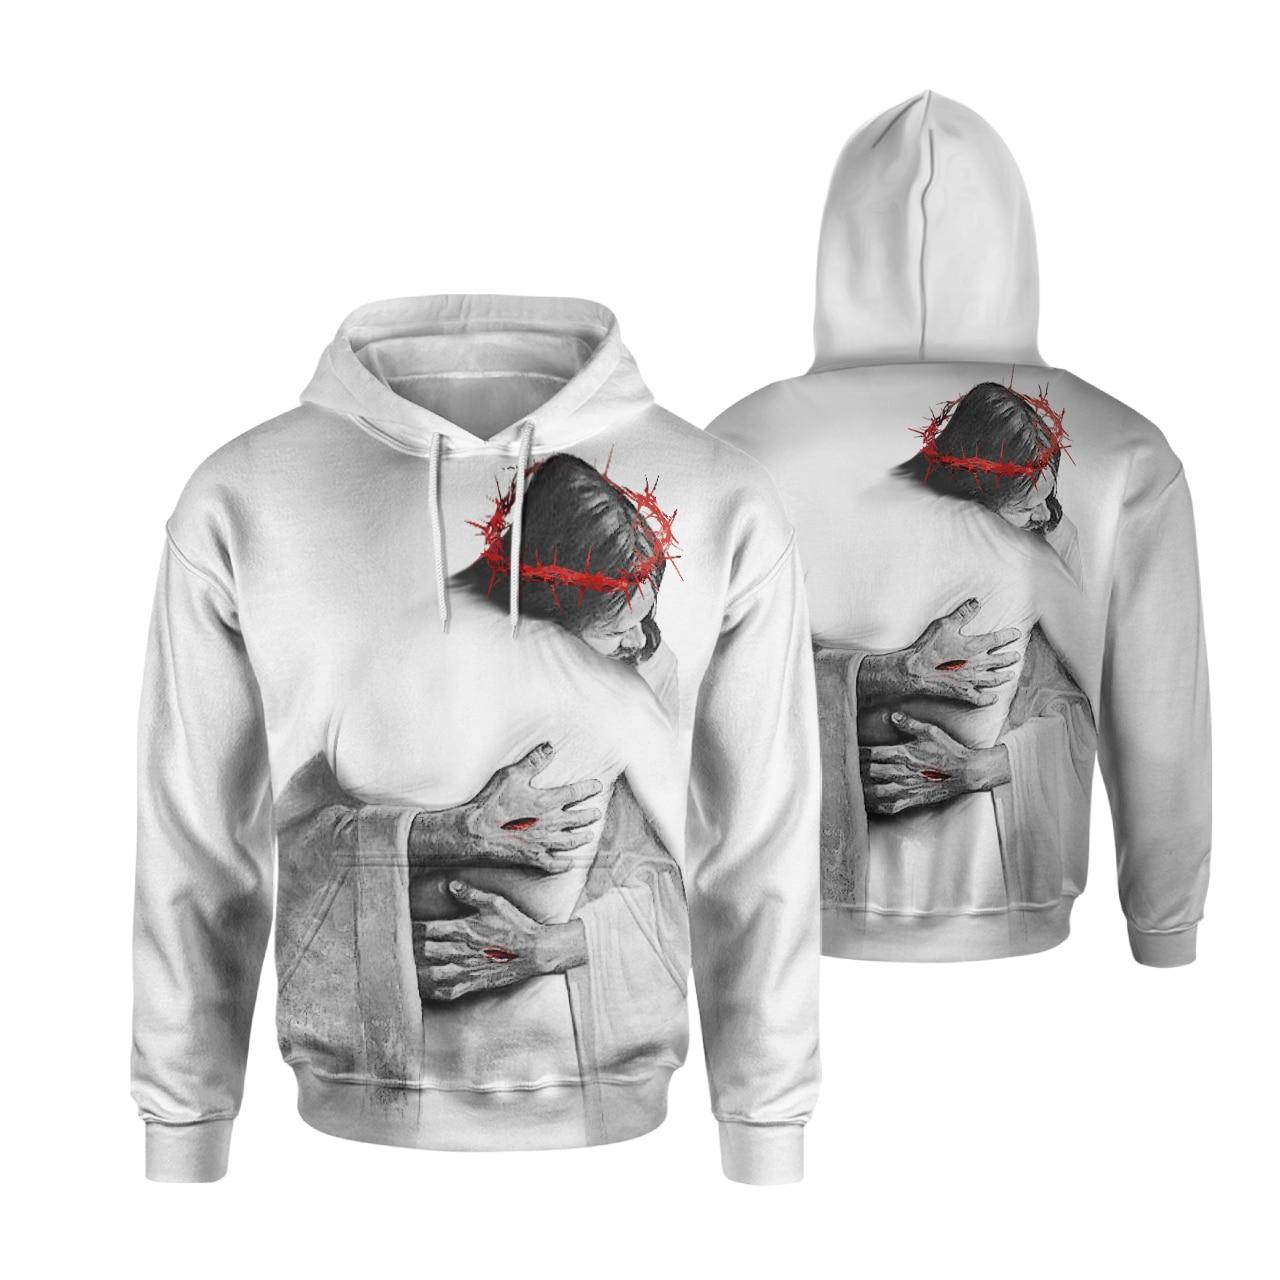 Women Men 3D Print Hoodies Pullovear Sweatshirts Jesus Harajuku style streetwear